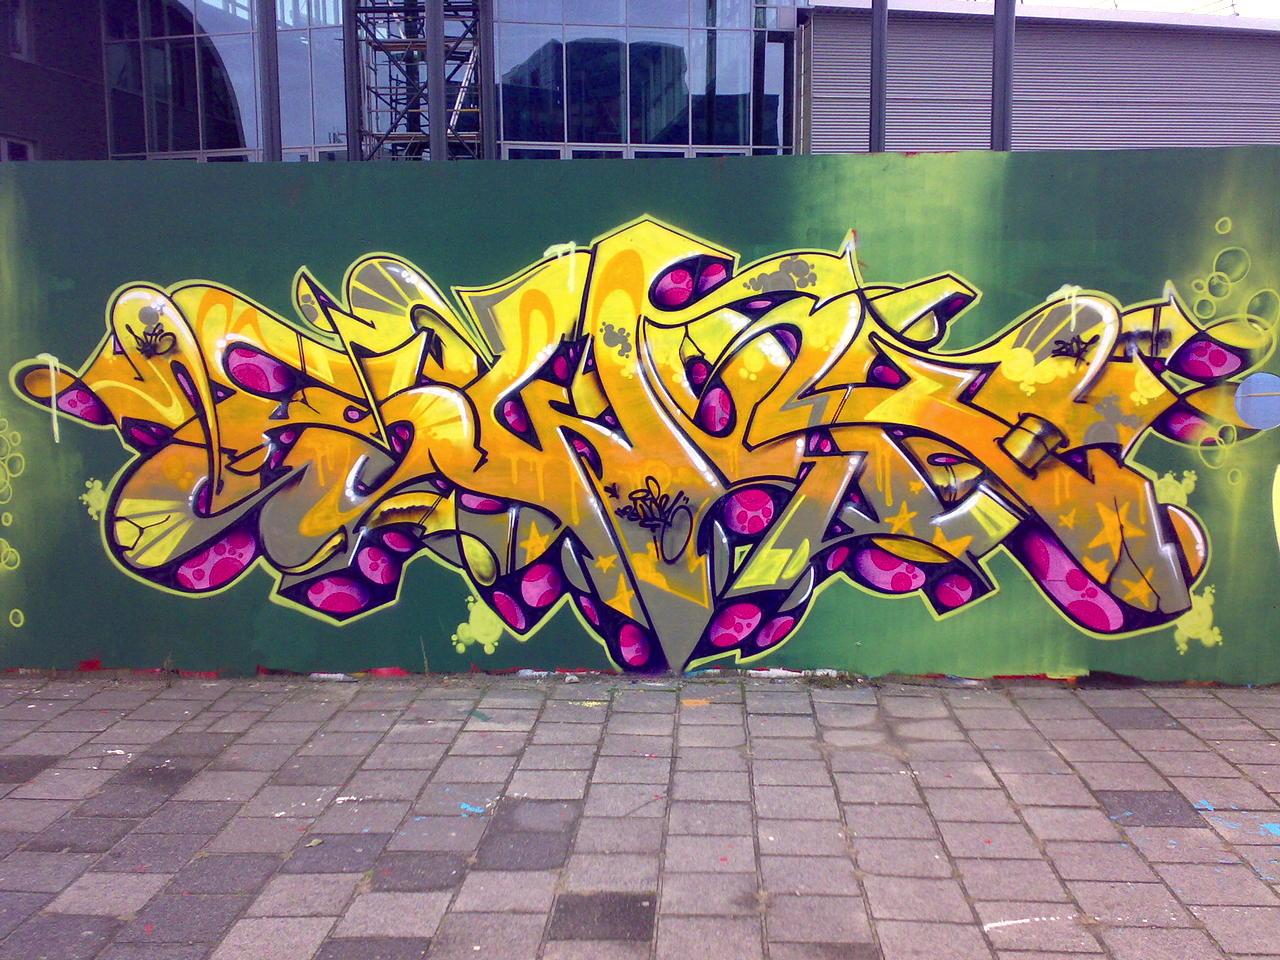 Рисунки пива, картинки графити с надписью